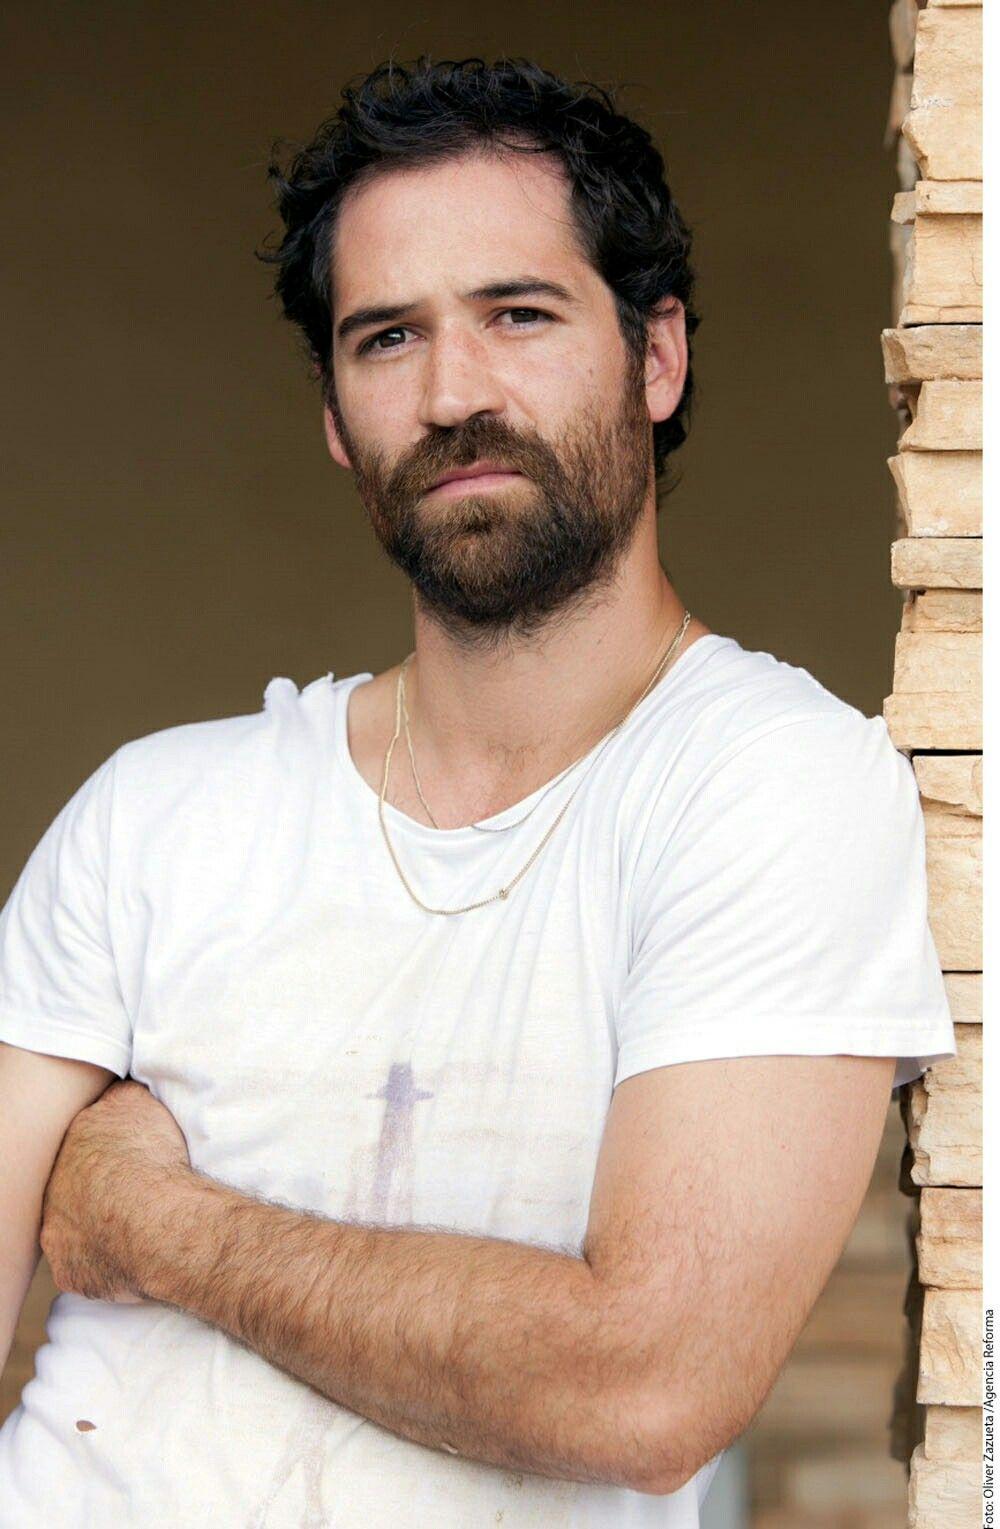 Manuel Garcia Rulfo Hottest Male Celebrities Celebrities Male Manuel Garcia Rulfo